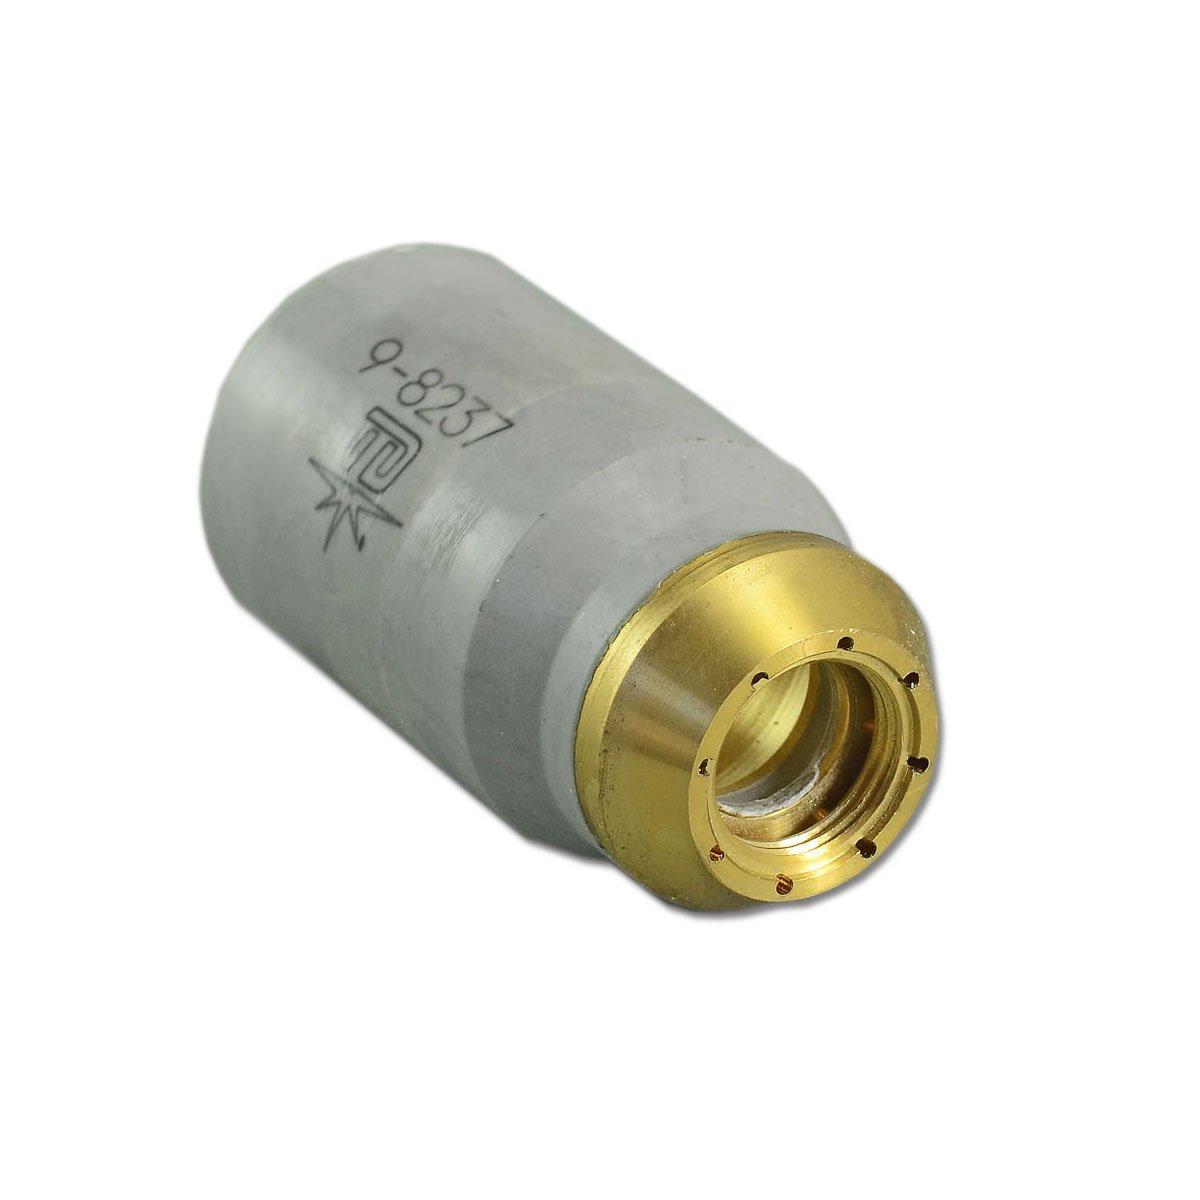 9-8237 Thermal Dynamics SL60 / SL100 A120 Shield Cup Cap Original RIVERWELDstore Thermal Dynamics SL60/SL100